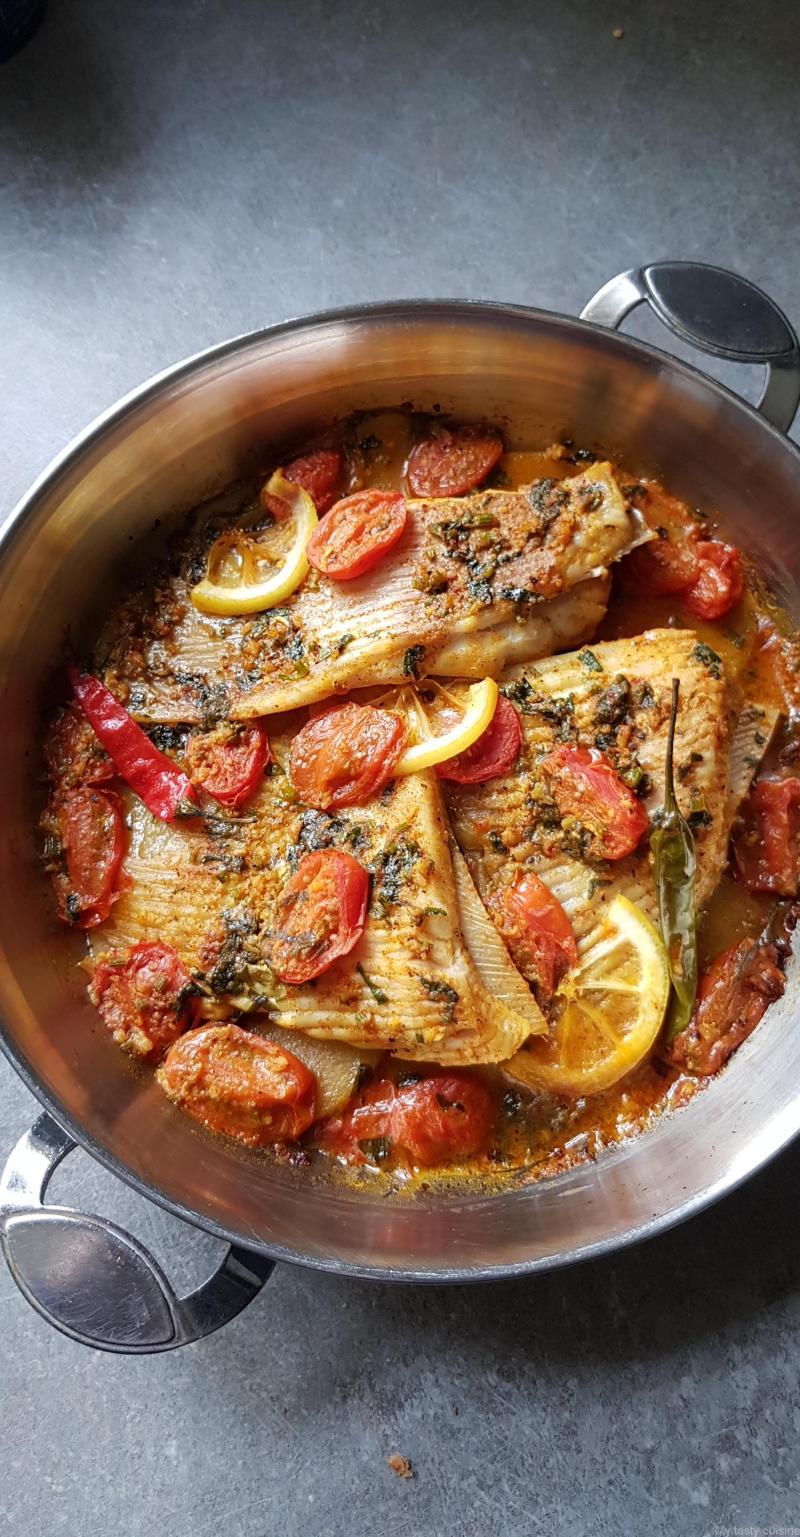 Recette Aile De Raie A La Poele : recette, poele, Ailes, Tajine, Tasty, Cuisine